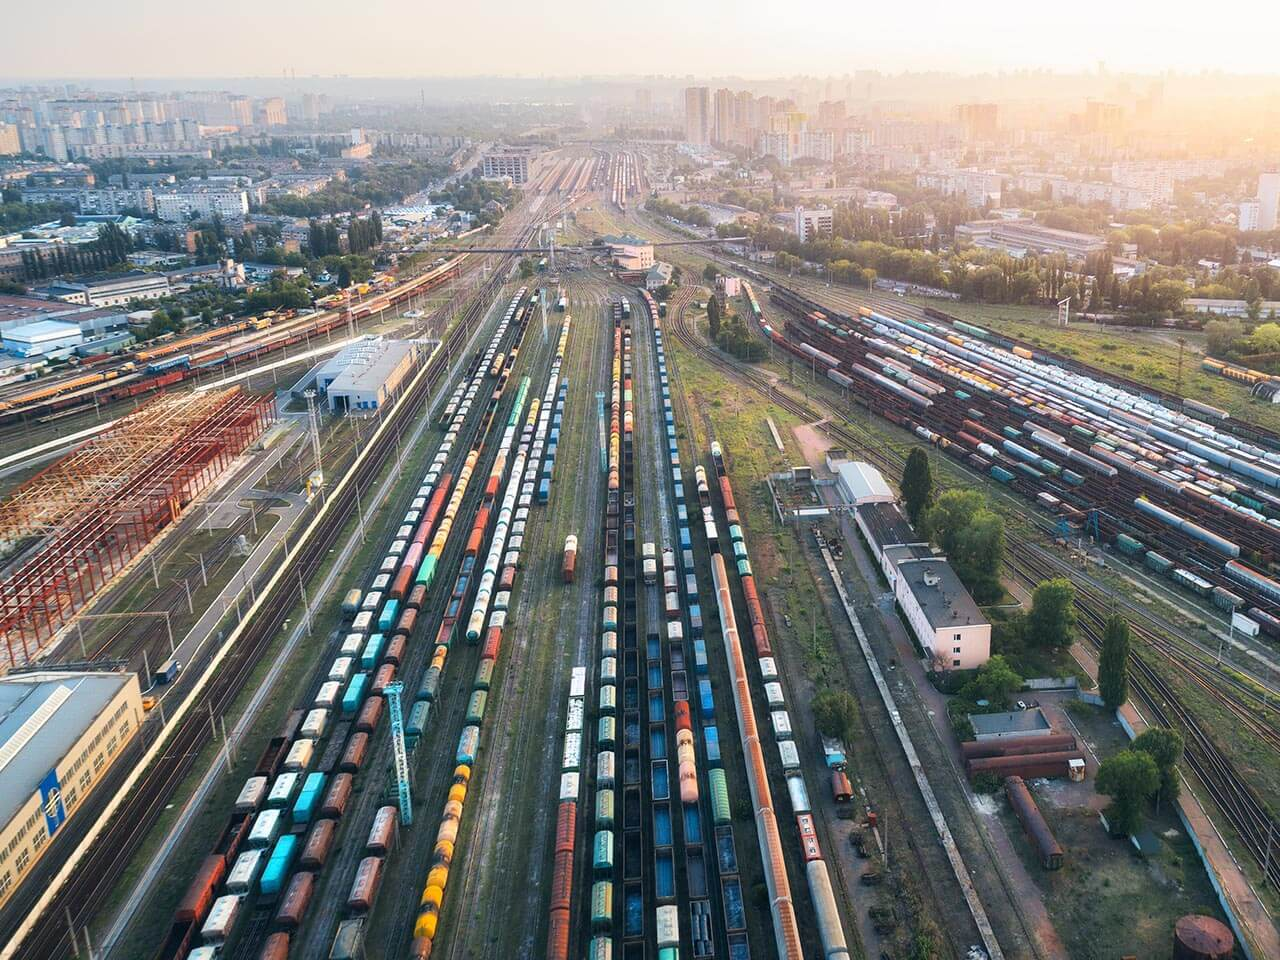 Key advantages of rail transport